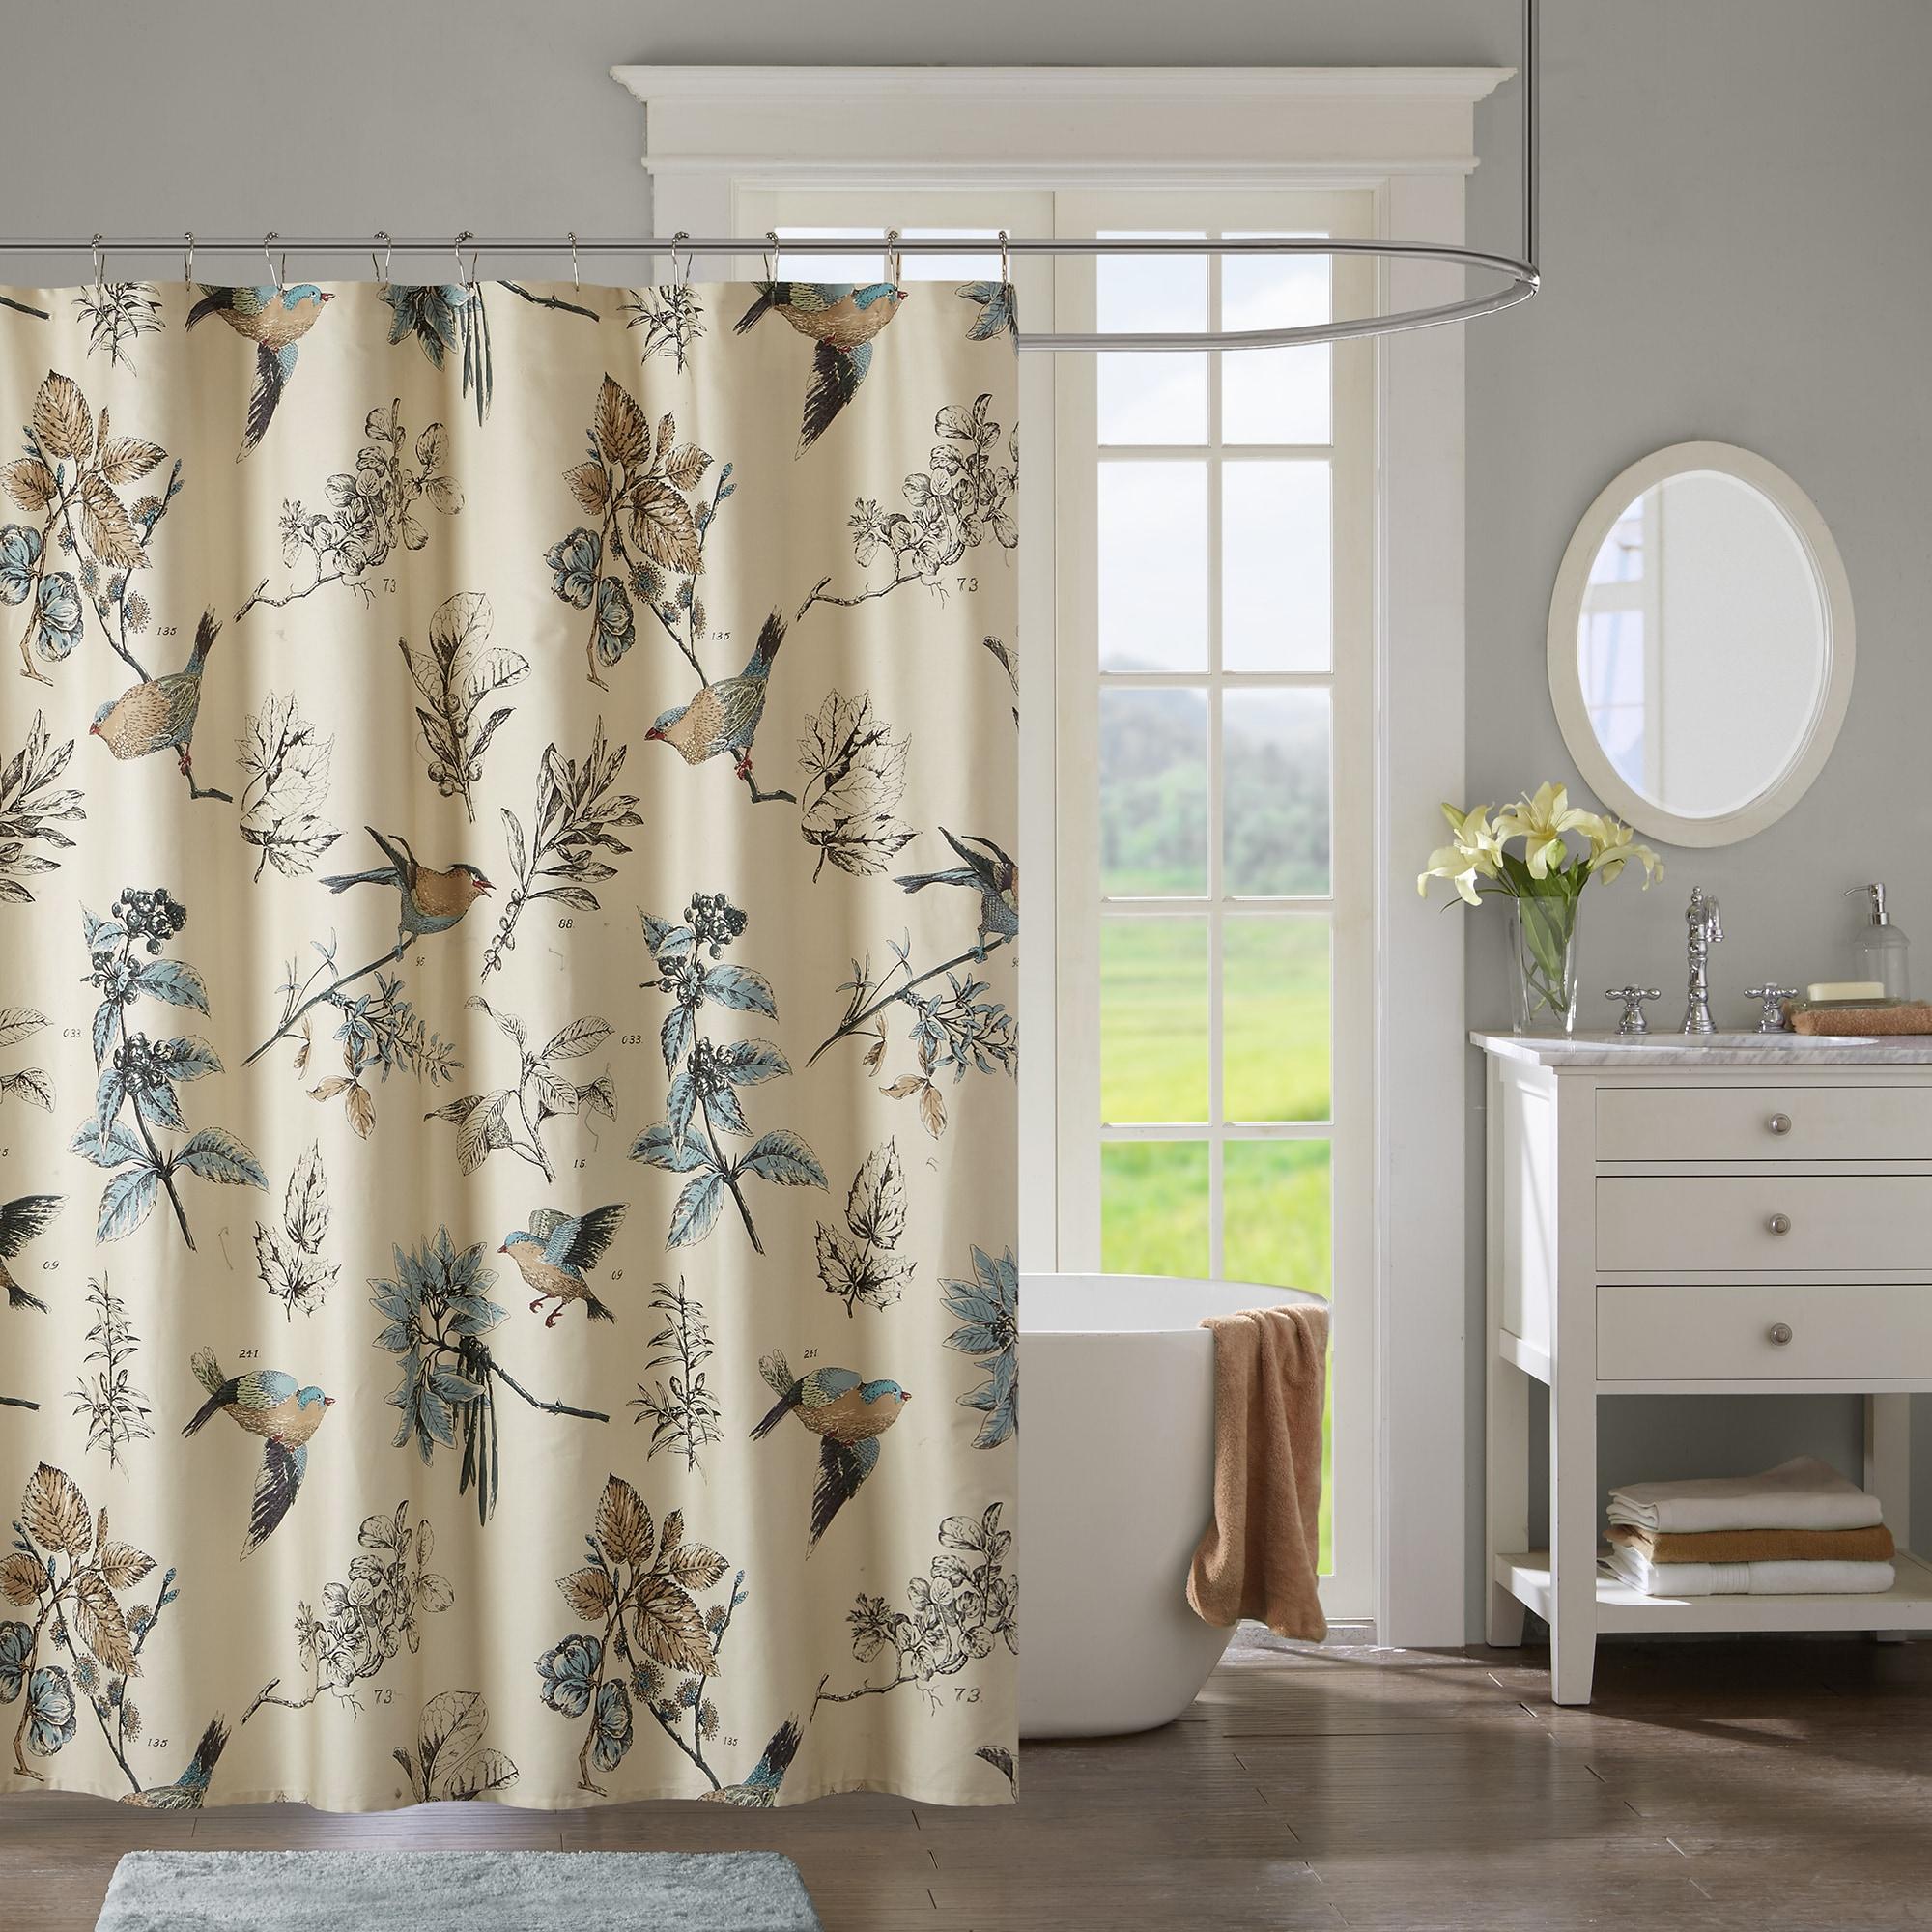 Shop The Gray Barn Mission Creek Khaki Printed Cotton Shower Curtain